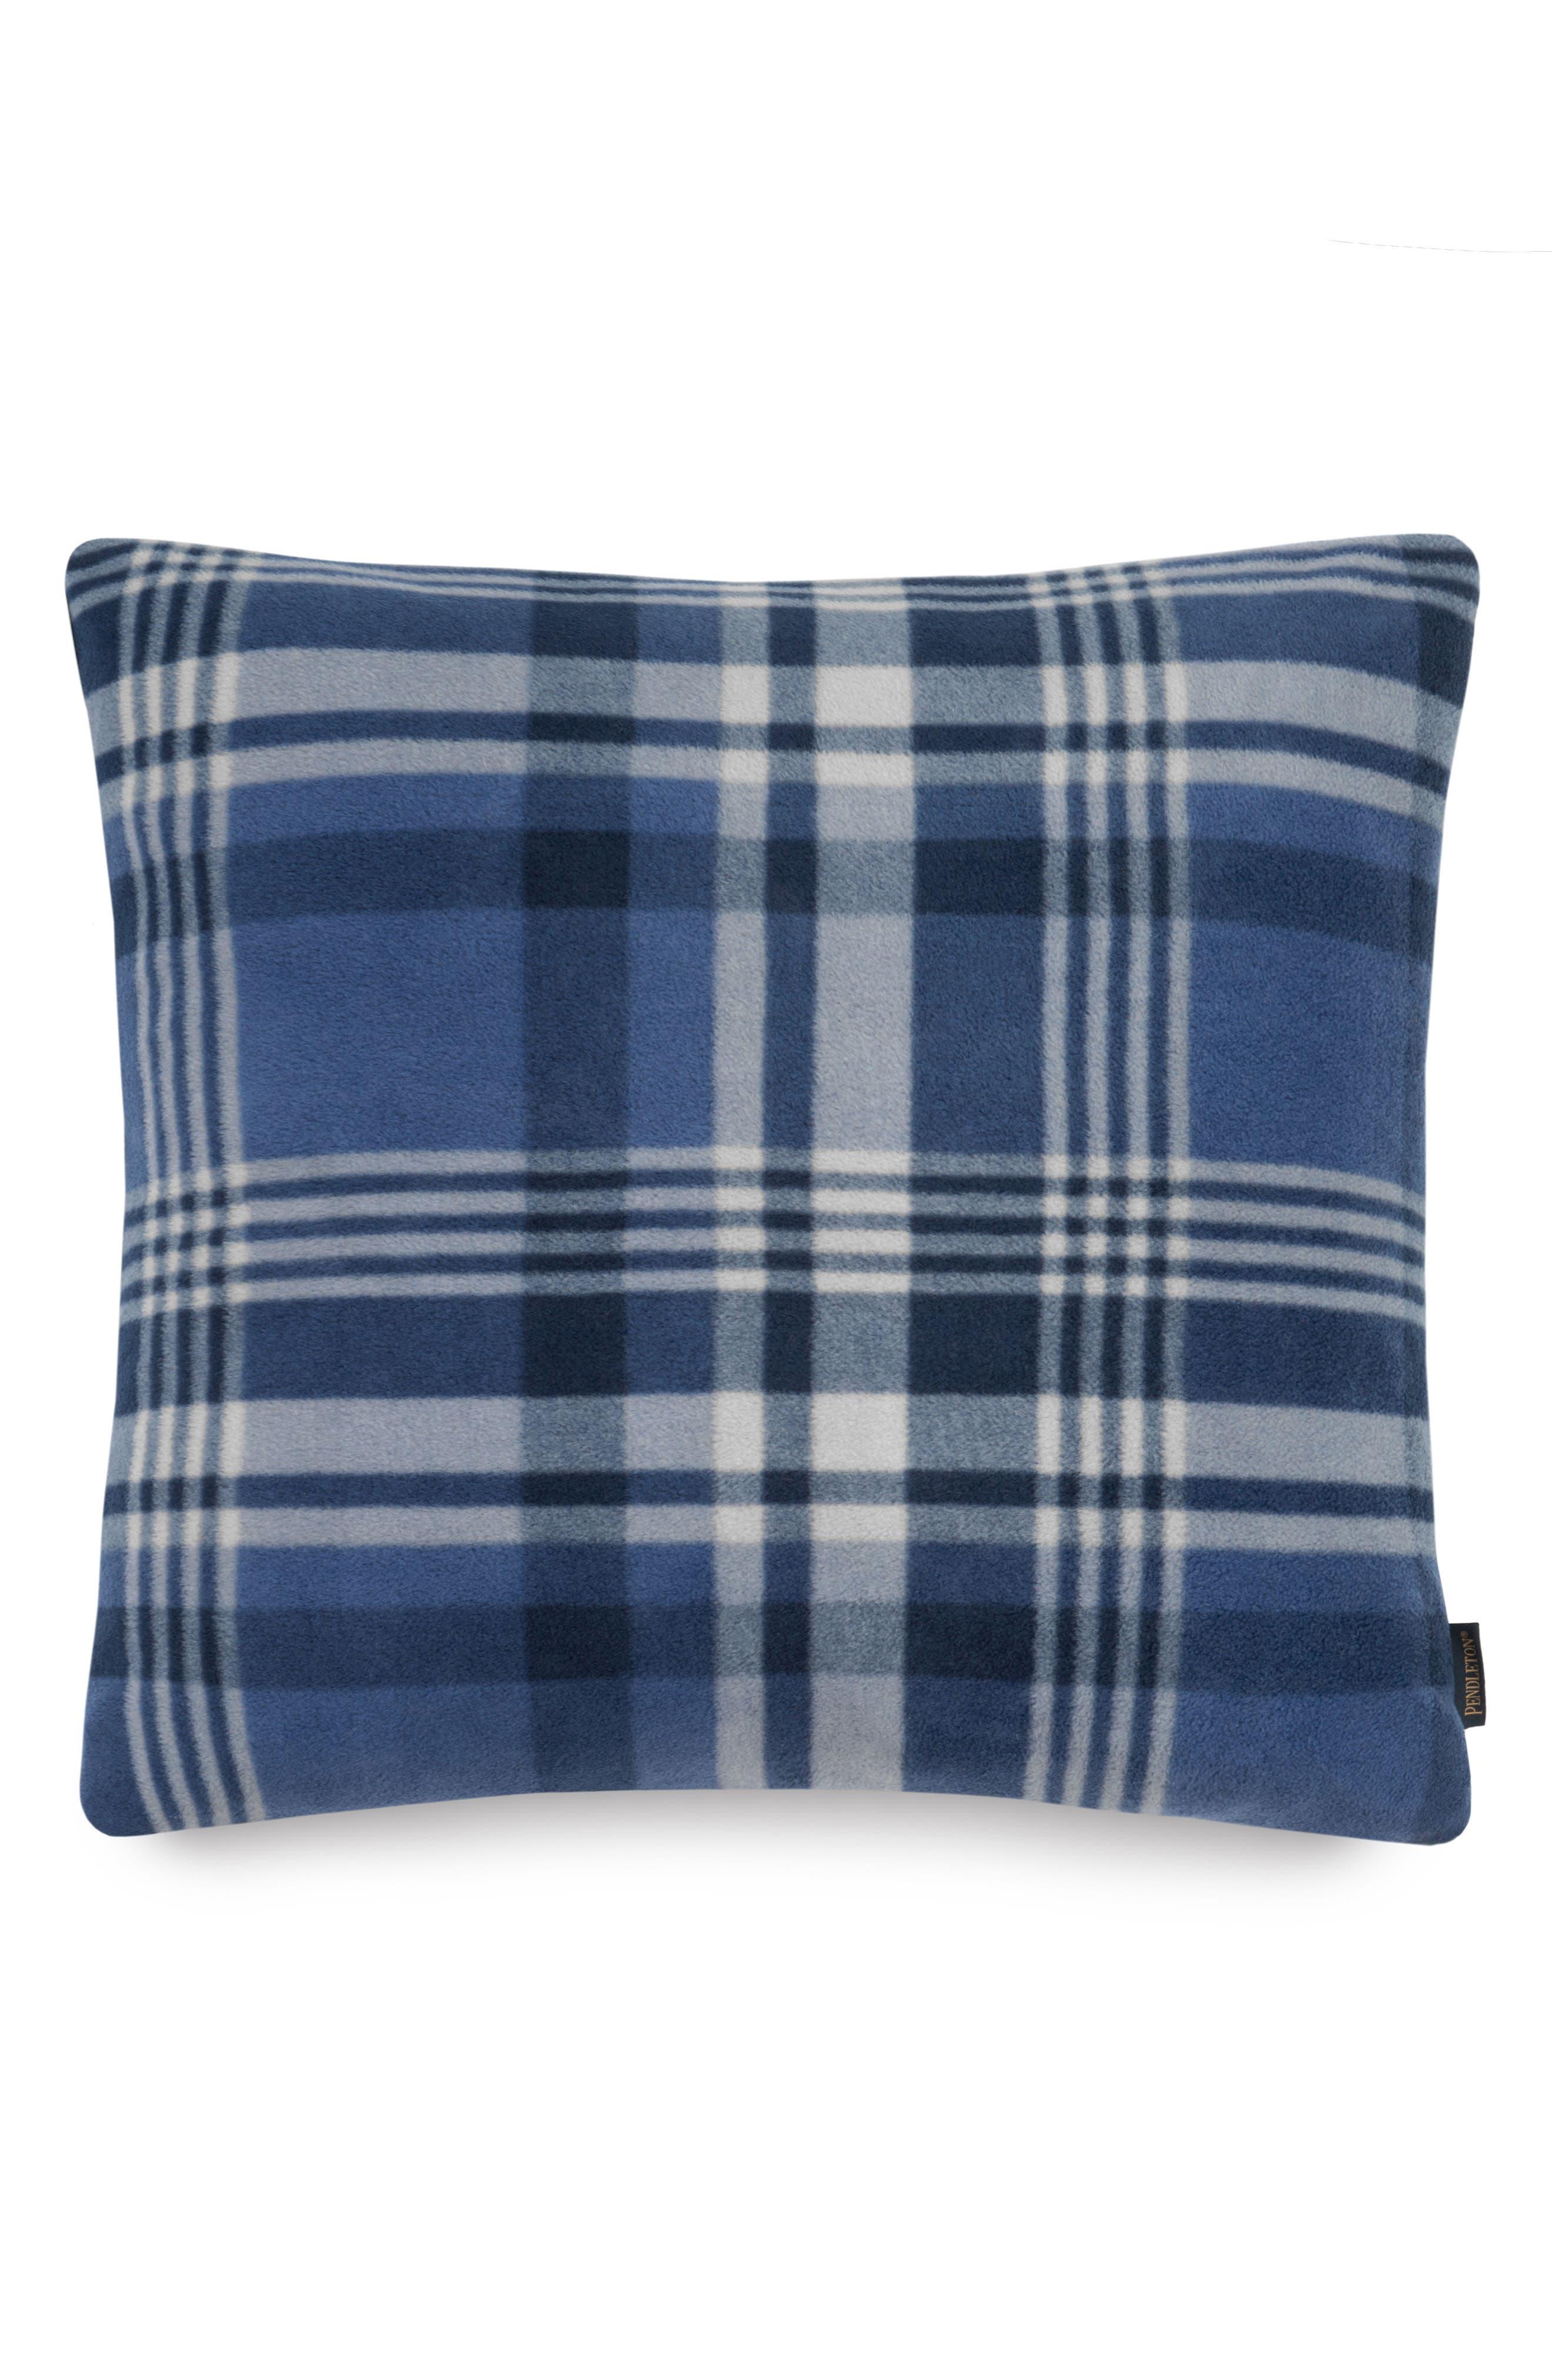 Alternate Image 1 Selected - Pendleton Teller Plaid Pillow